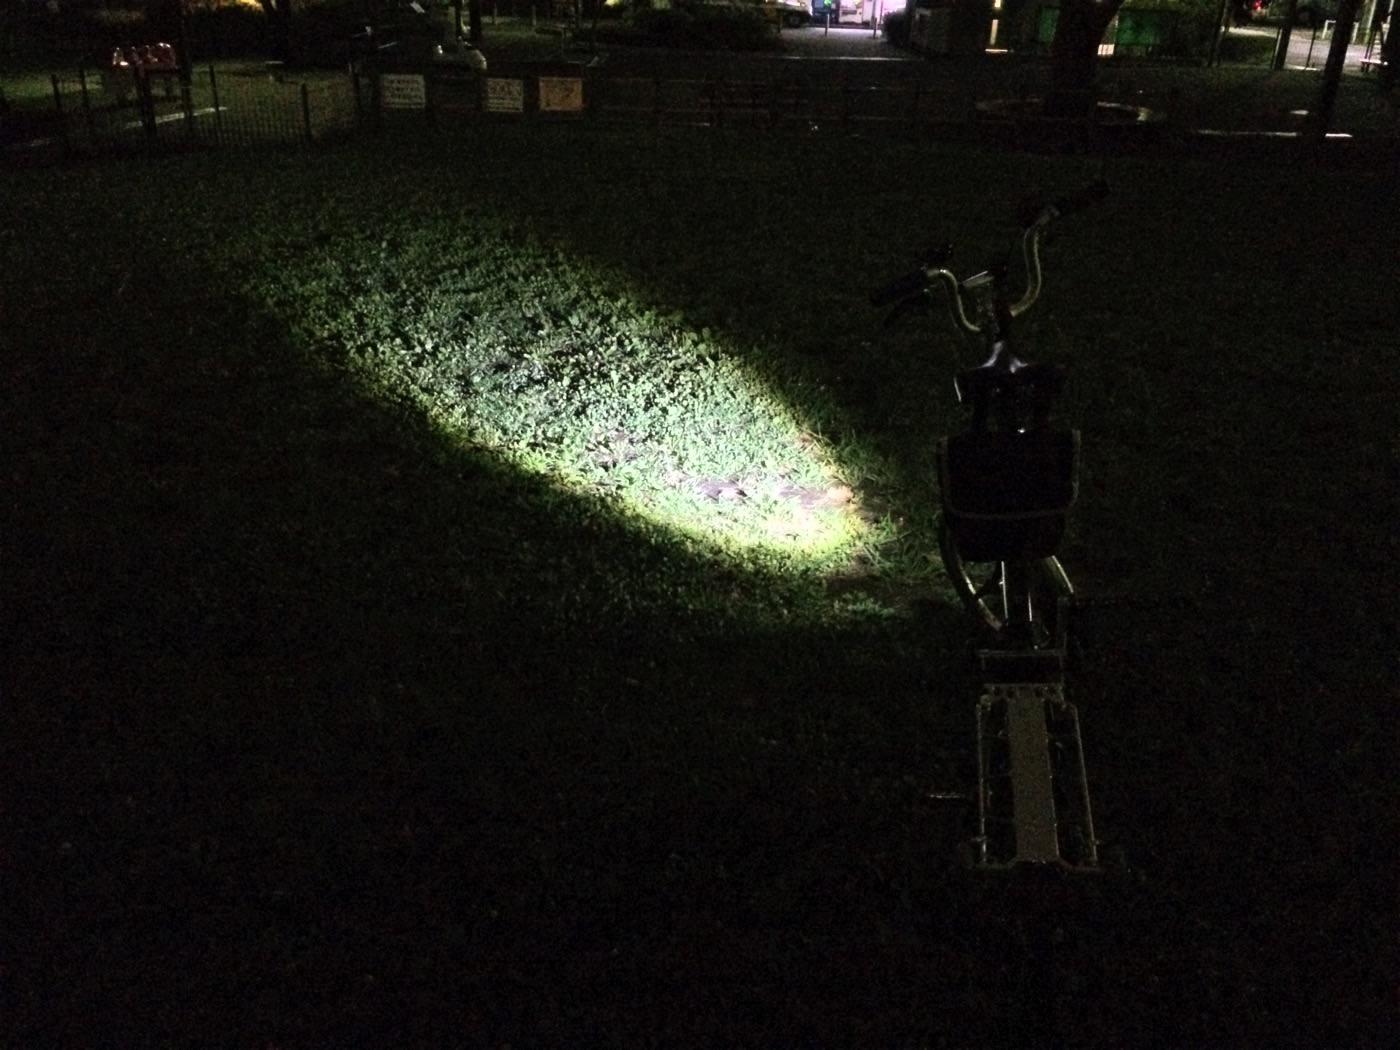 Cree q5 led handy light zoom 00015